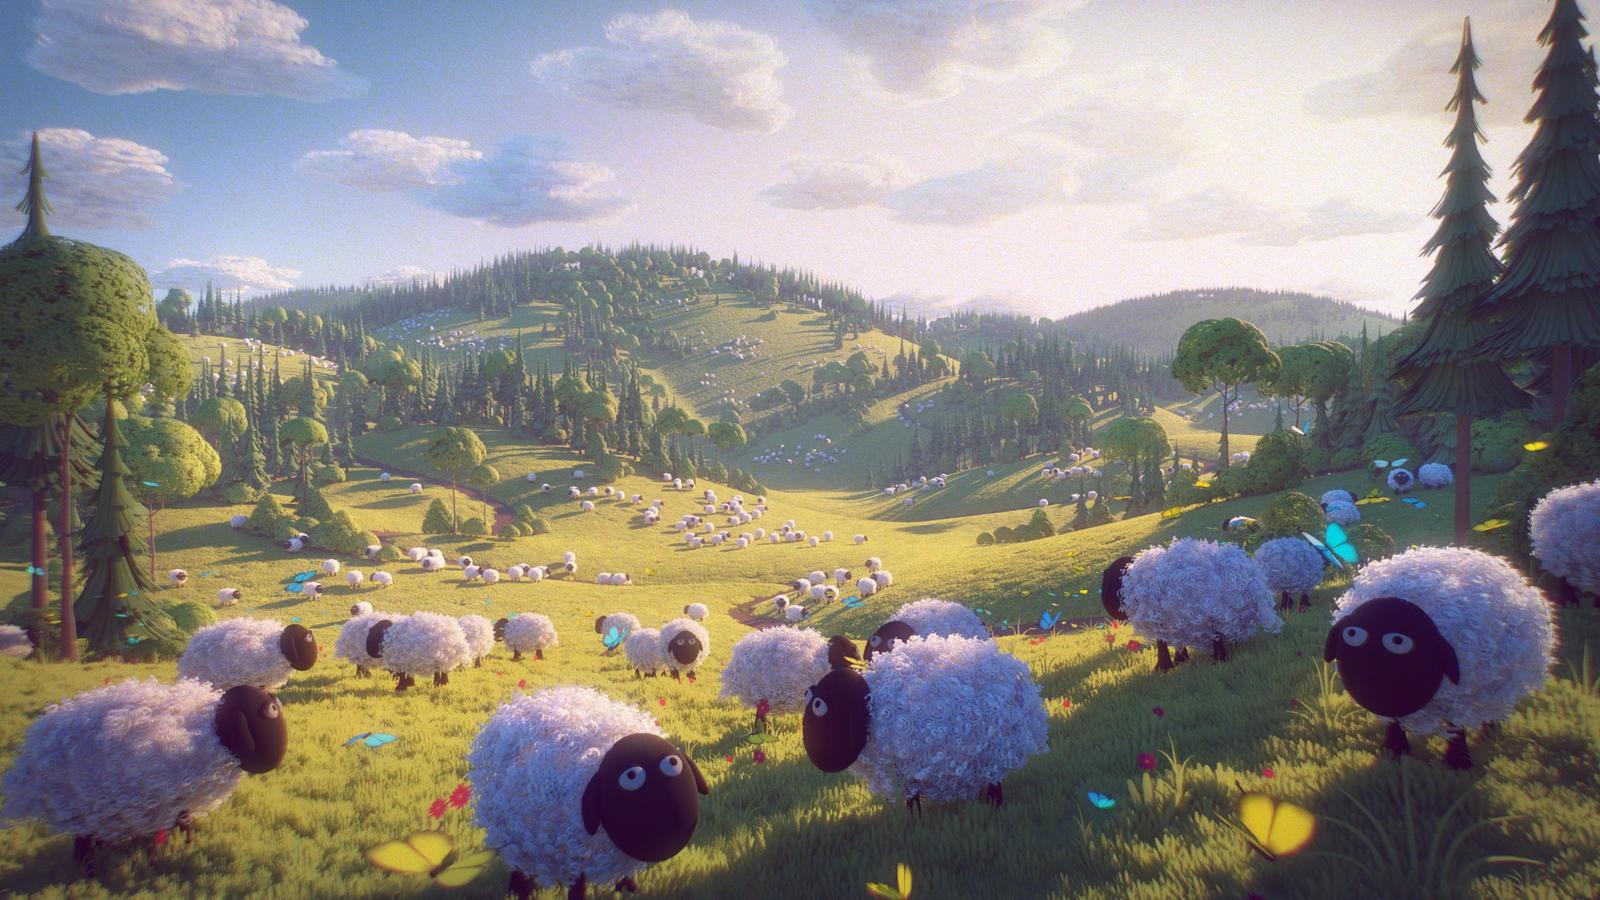 Sheepland by MilanVasek